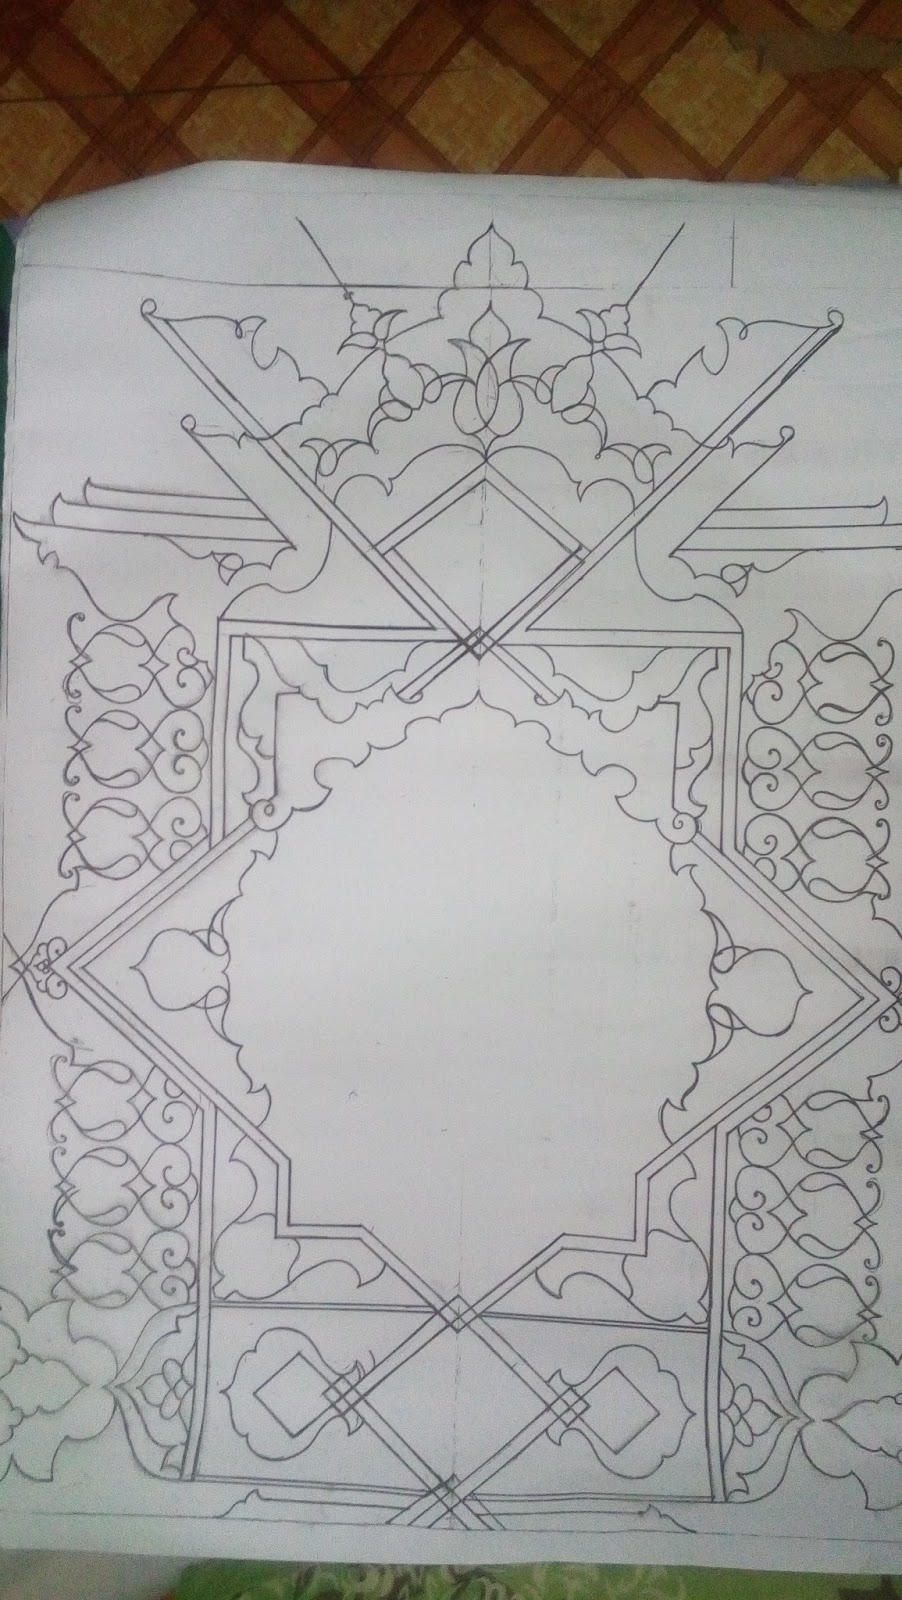 Hiasan Pinggir Kaligrafi : hiasan, pinggir, kaligrafi, Sketsa, Hiasan, Pinggir, Kaligrafi, Bunga, Cikimm.com